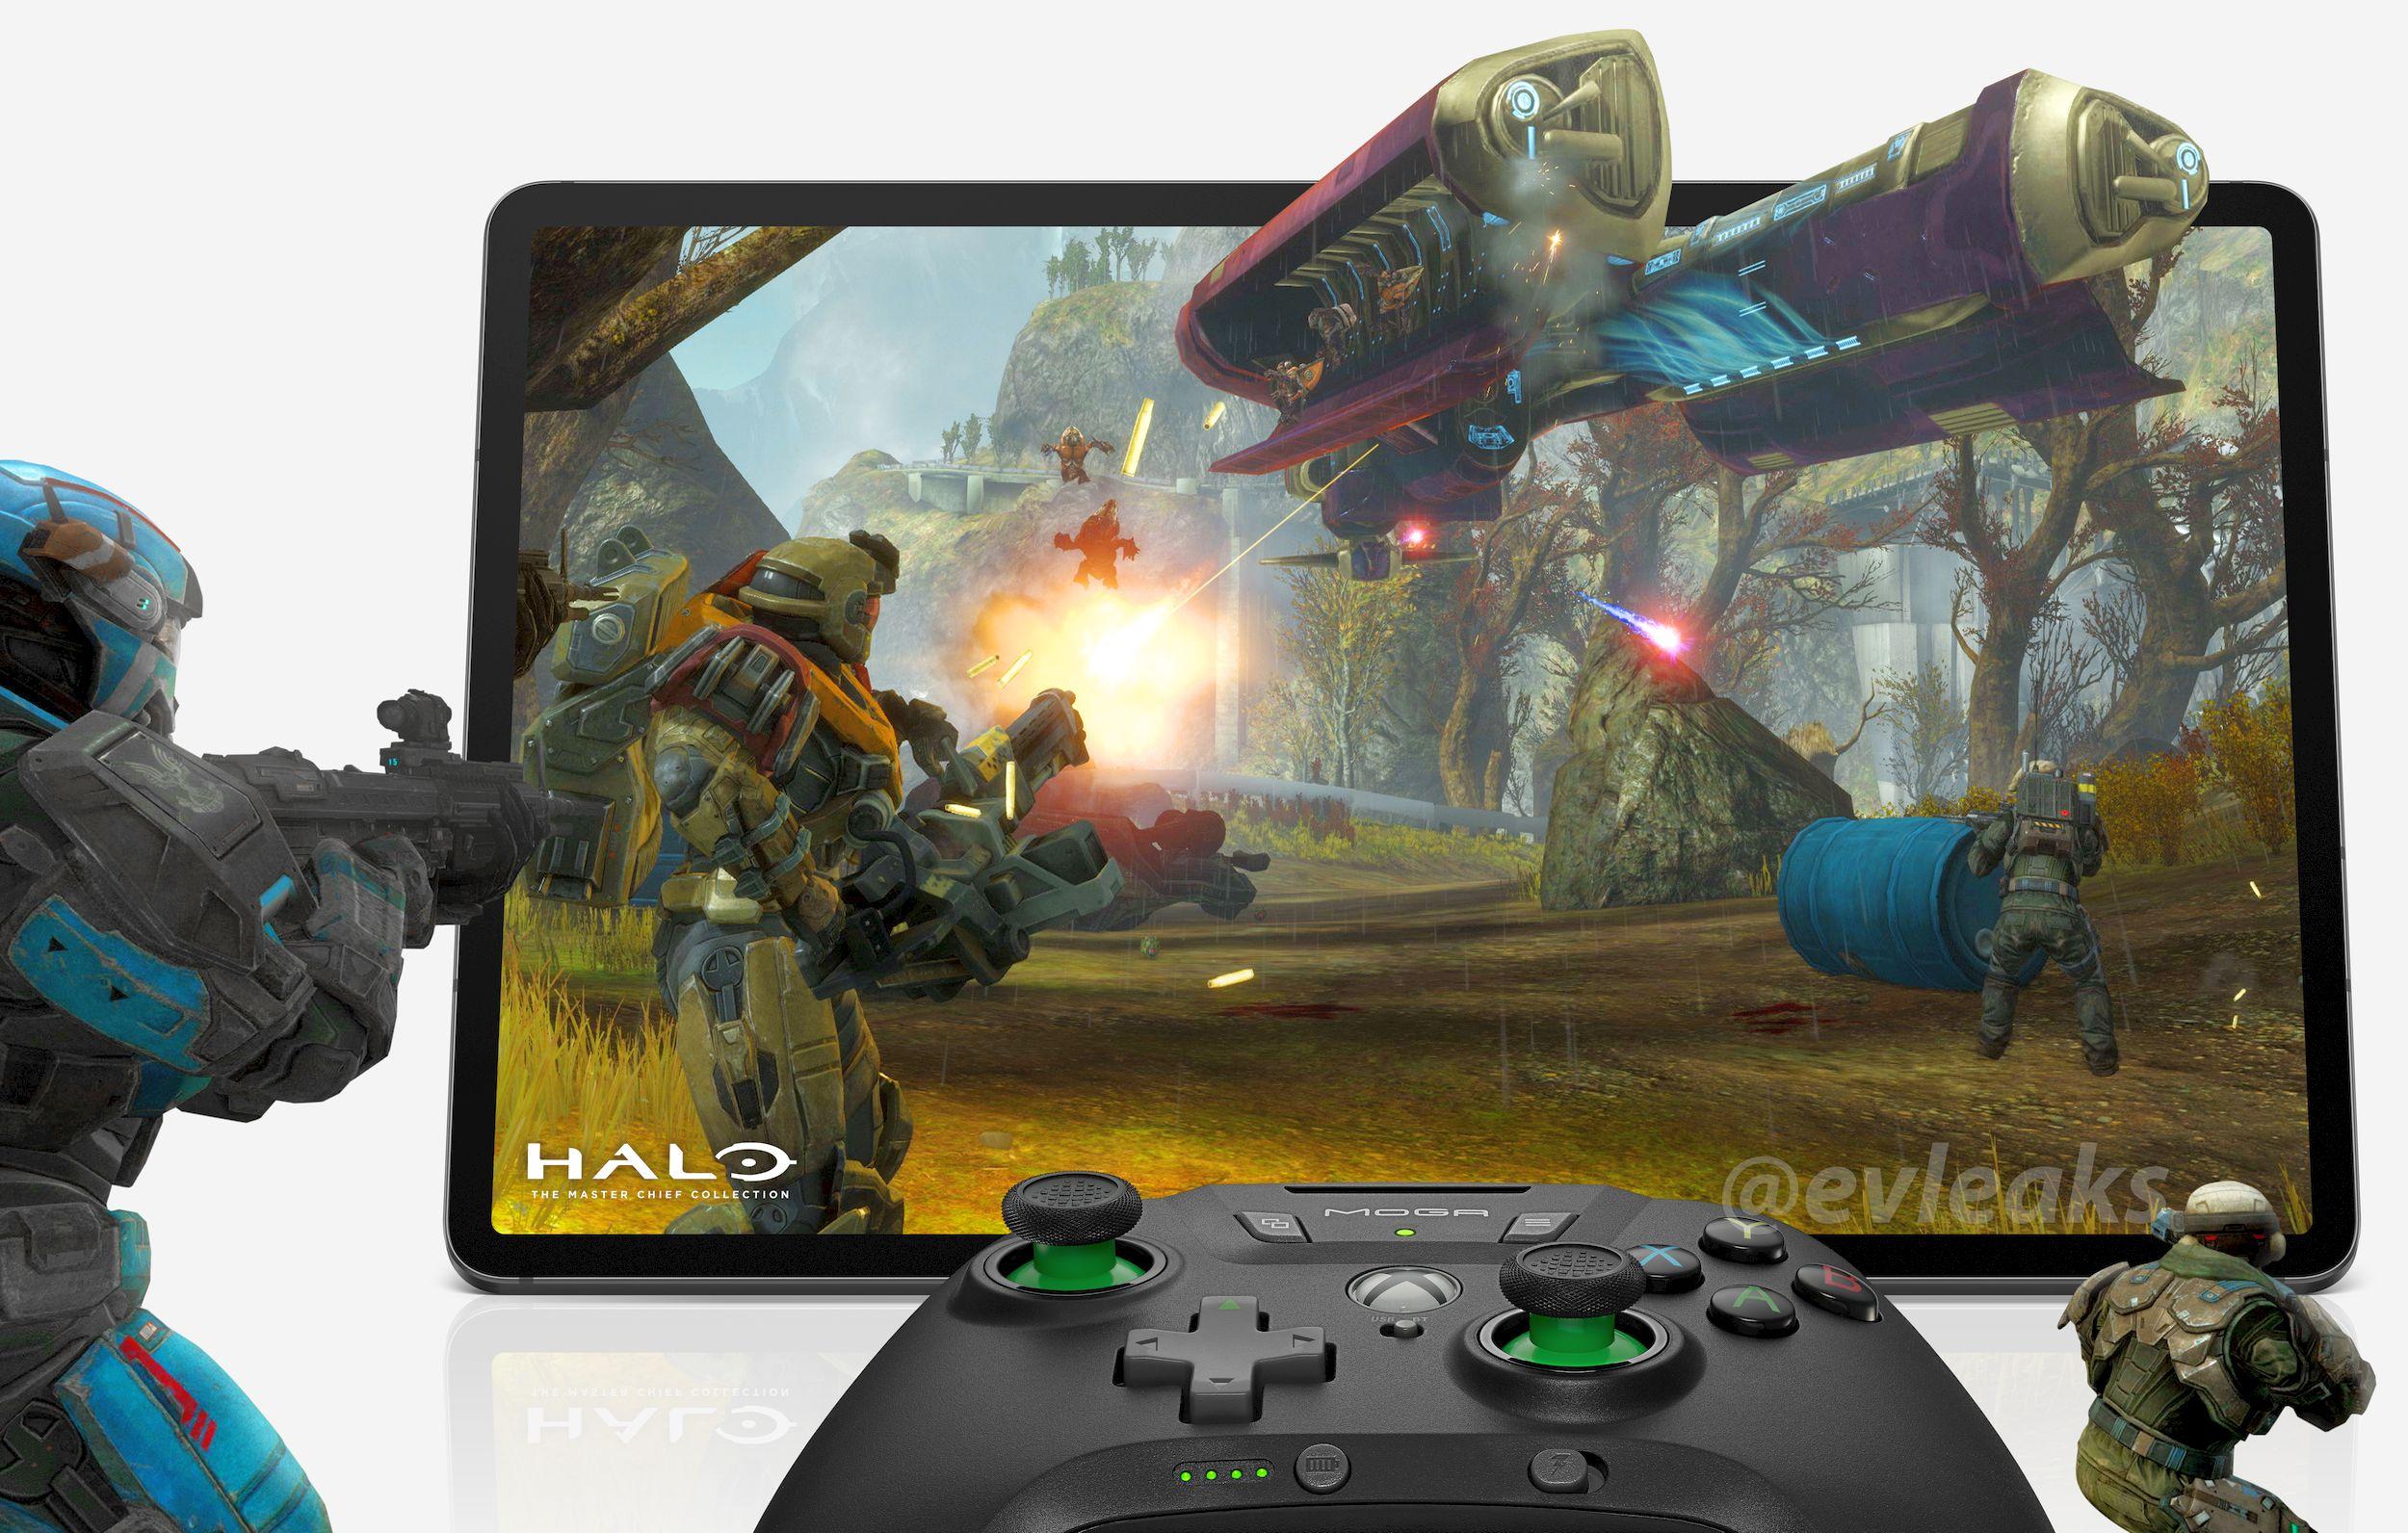 Samsung Galaxy Tab S7 Plus Xbox Game Pass